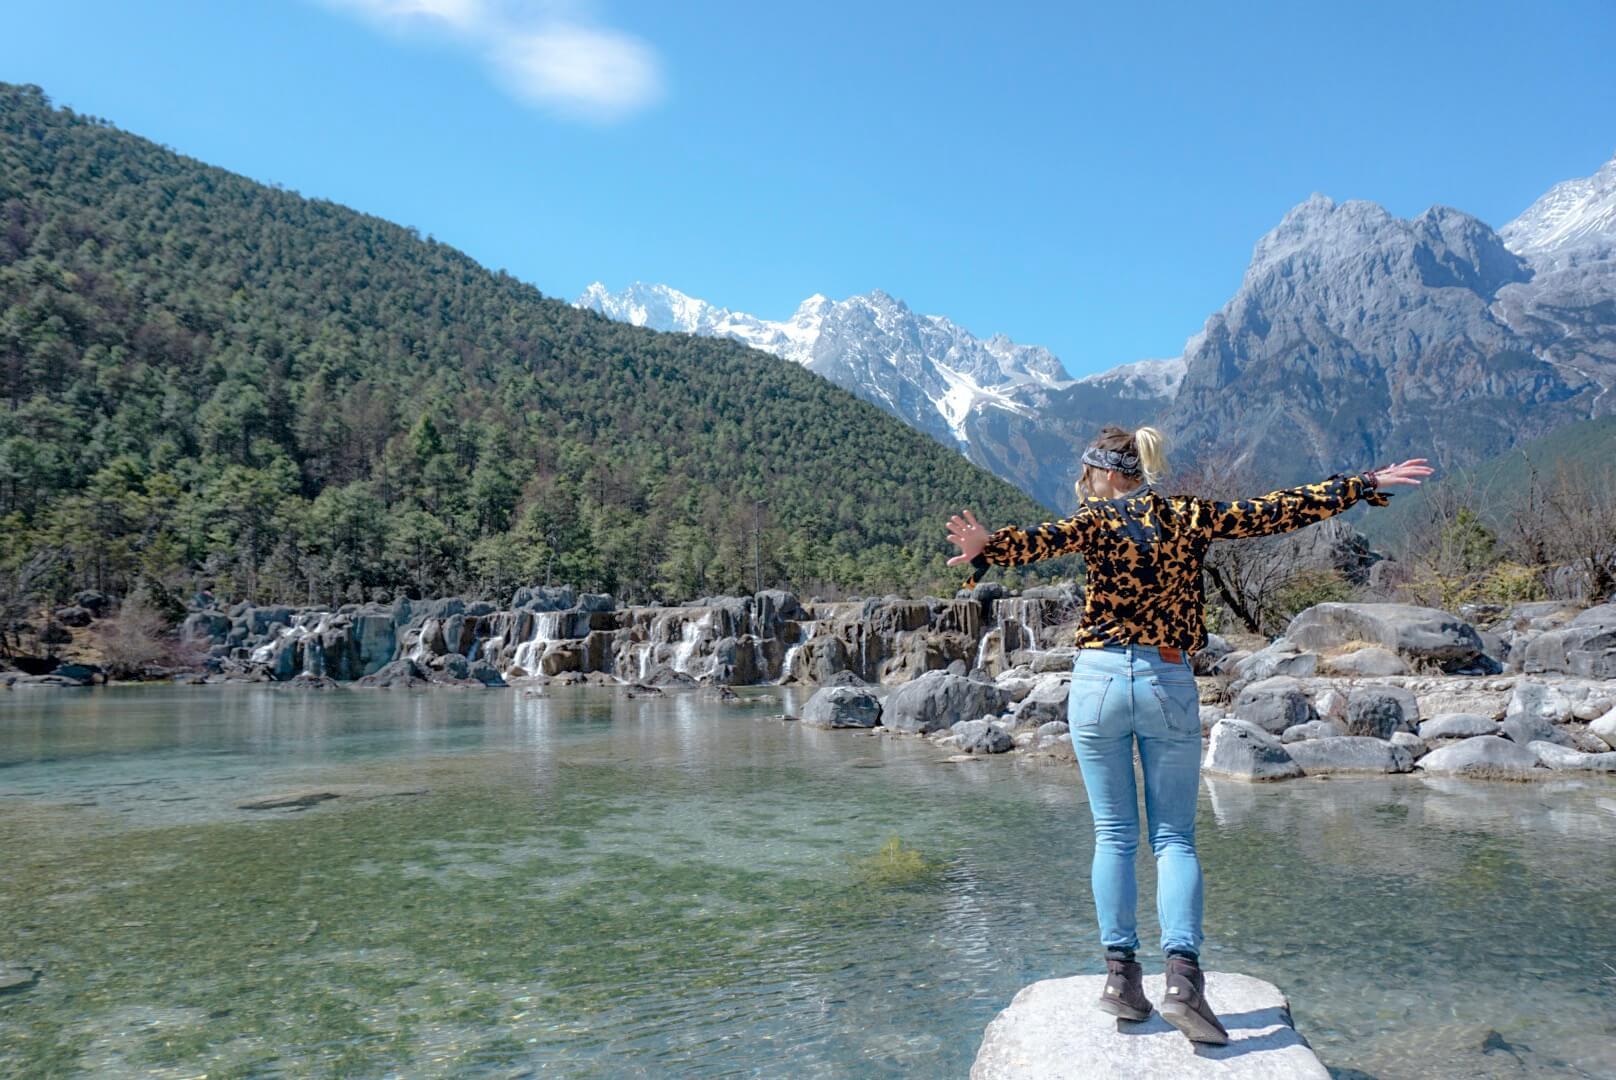 avis visite parc blue moon valley chine Yunnan Lijiang